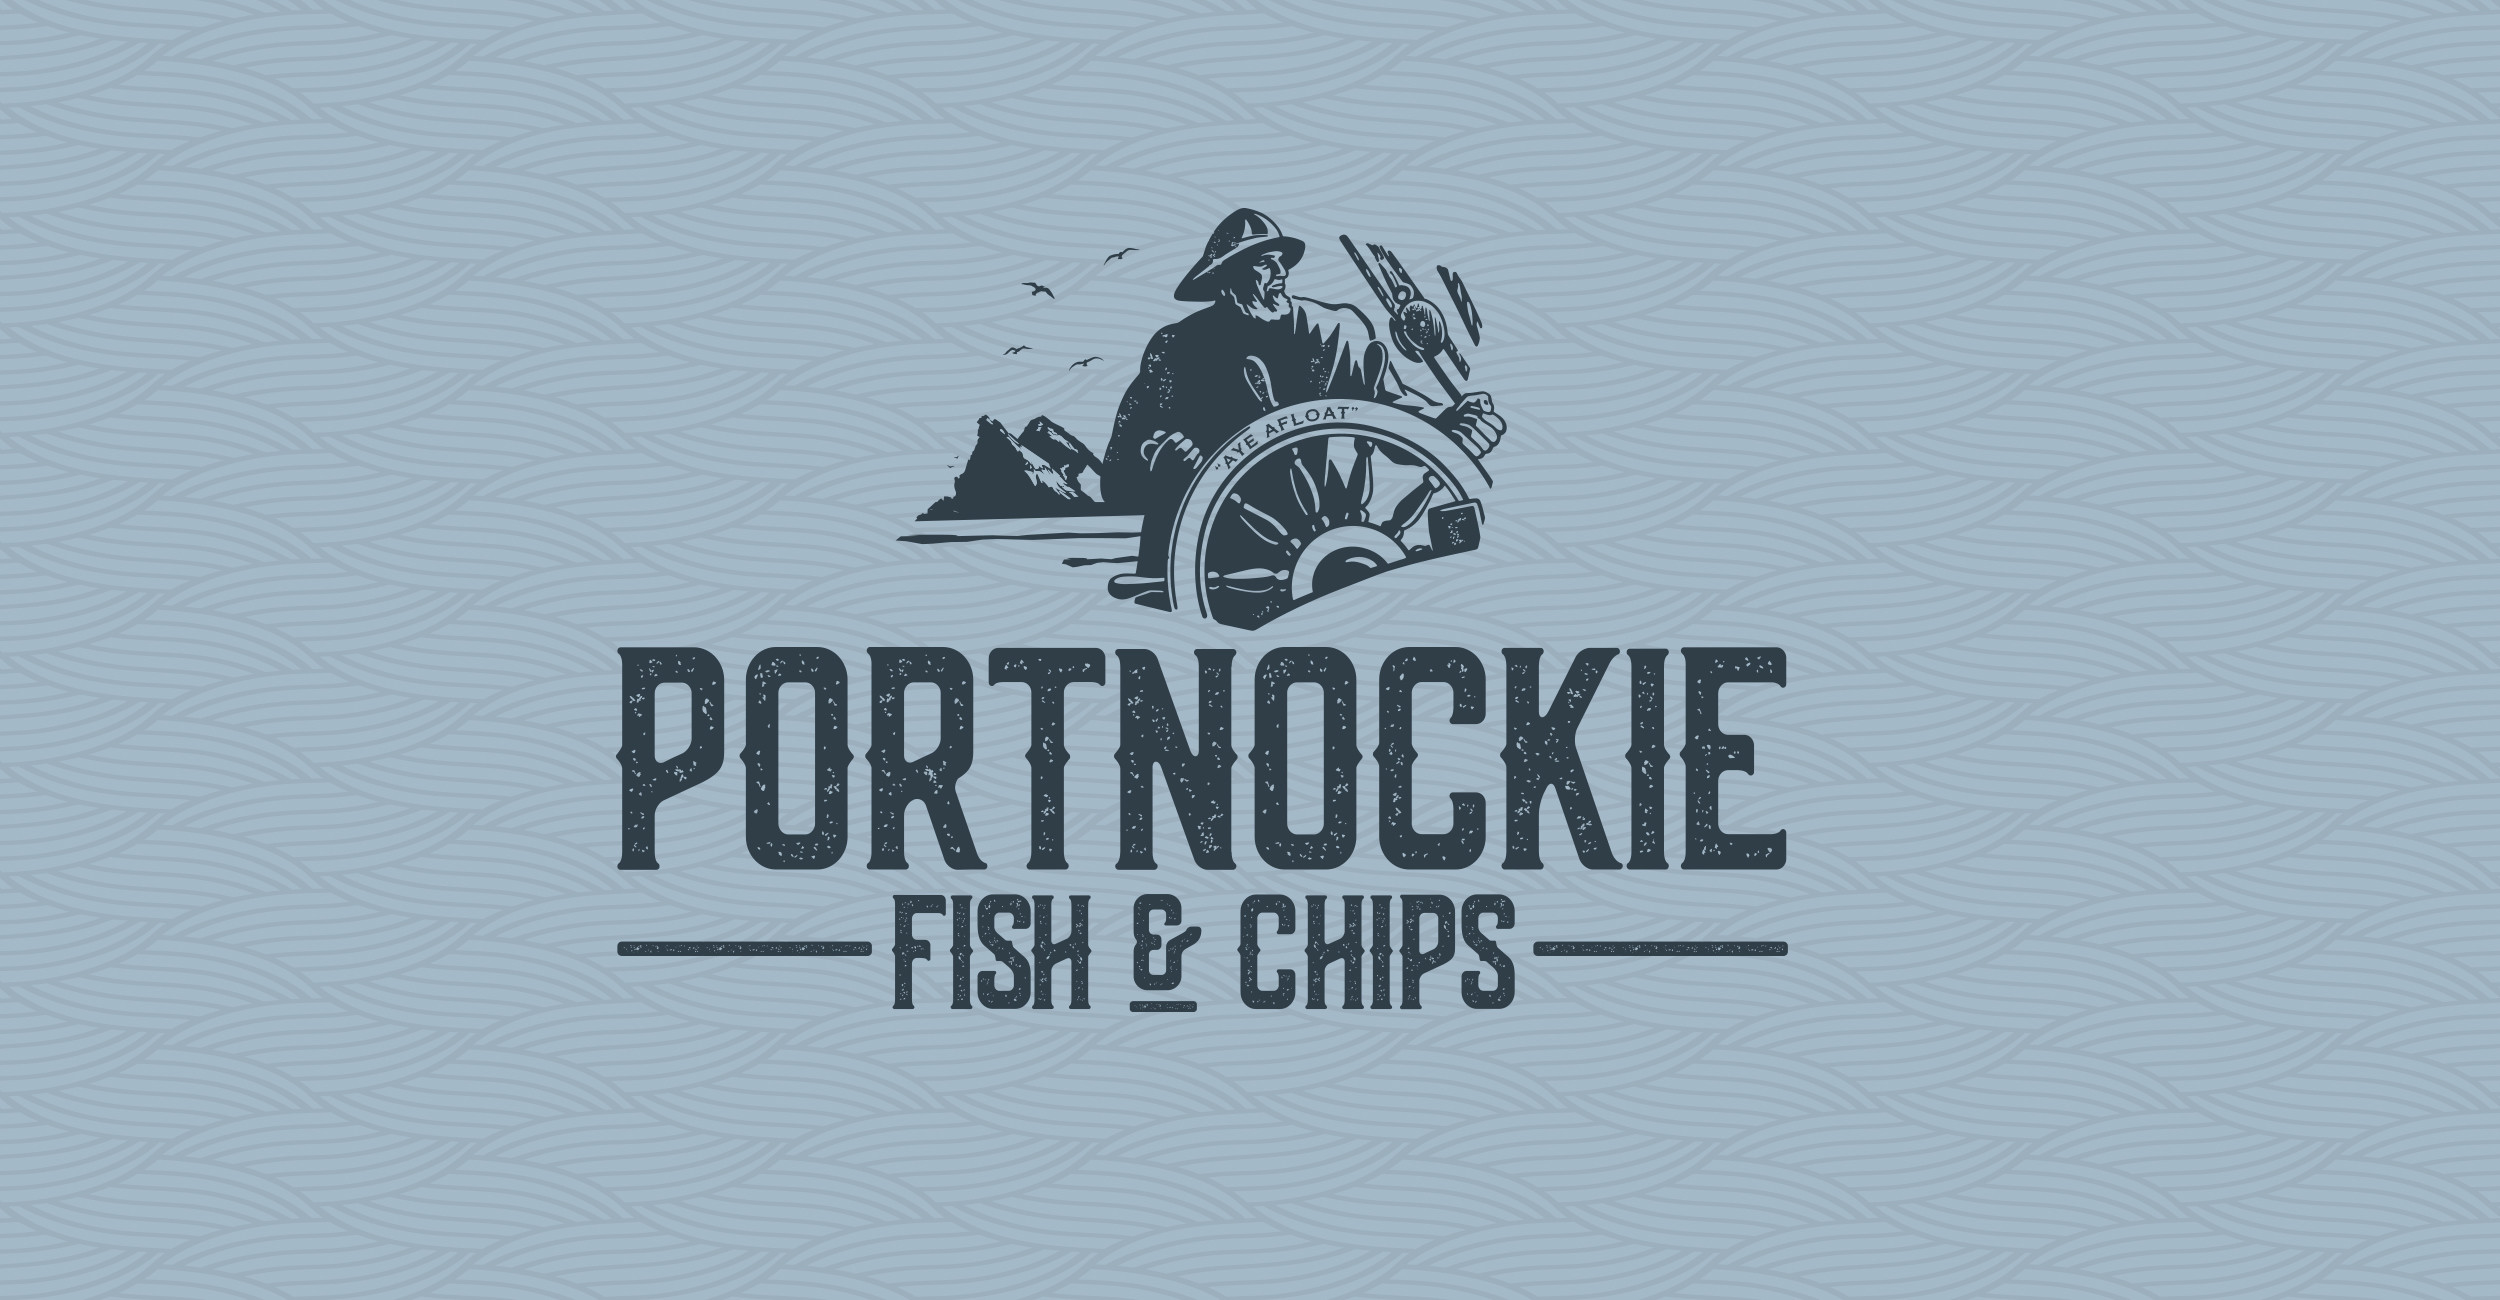 Portknockie Chip Shop